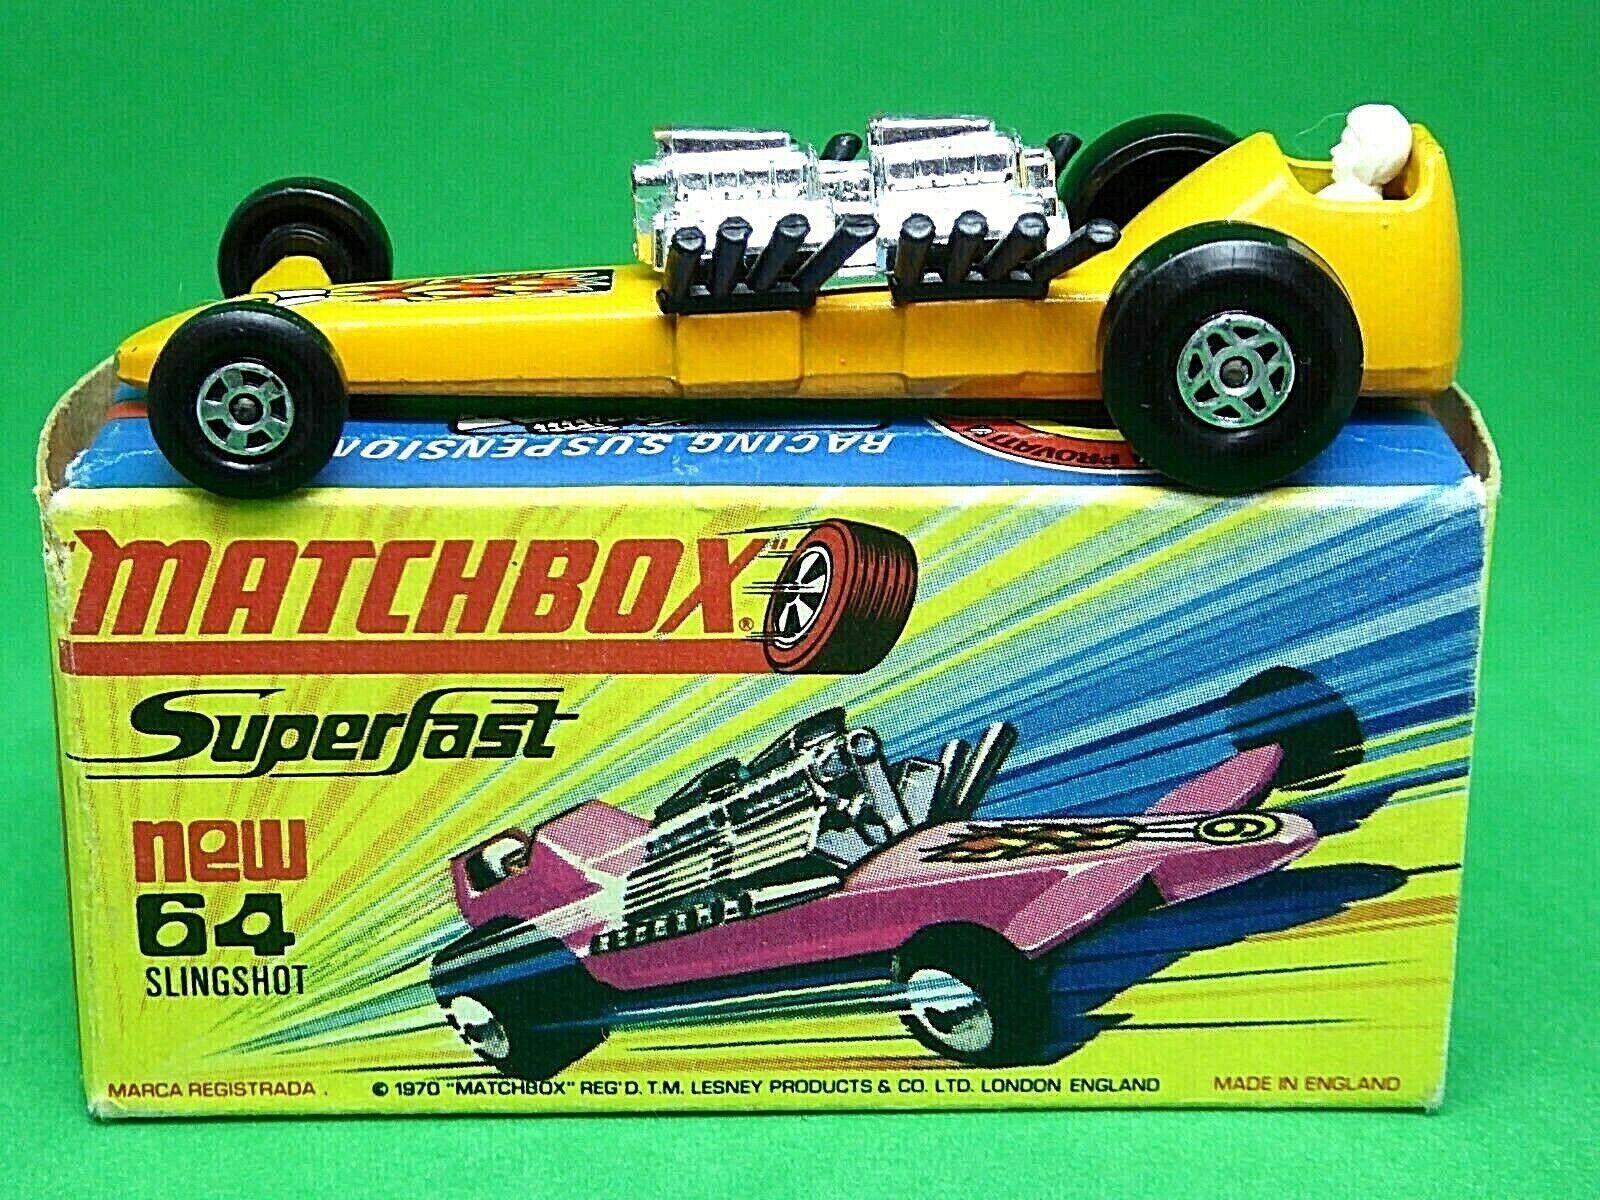 Matchbox Lesney No.64c Slingshot Dragster H1 'New' Box (VERY RARE LIGHT orange)